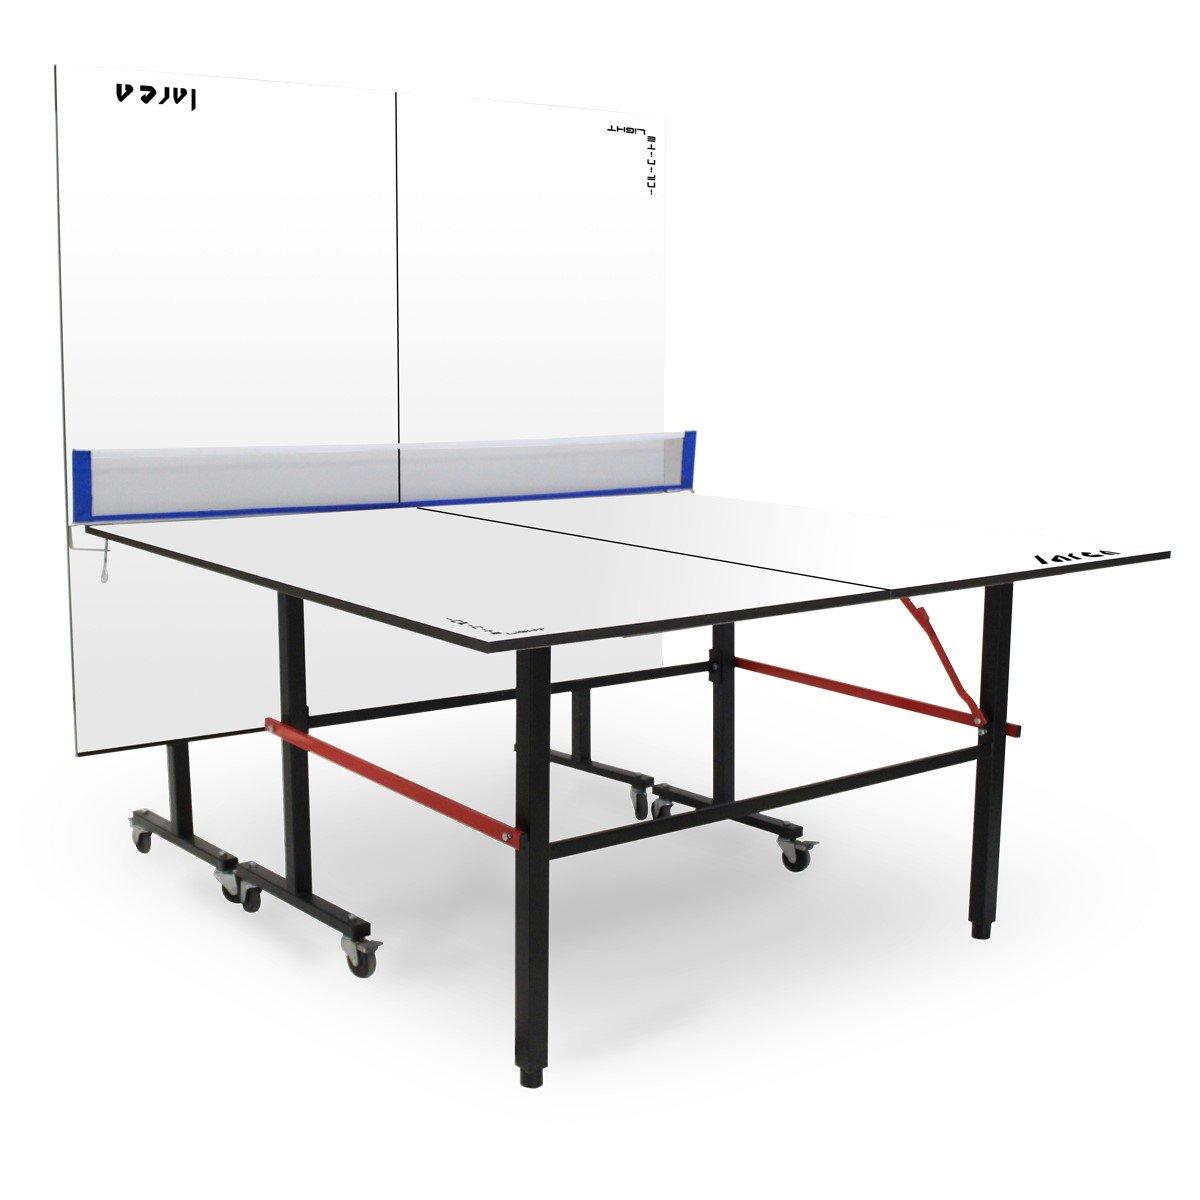 Mesa de ping pong inifinite light larca sears com mx me entiende - Mesa de ping pong precio ...